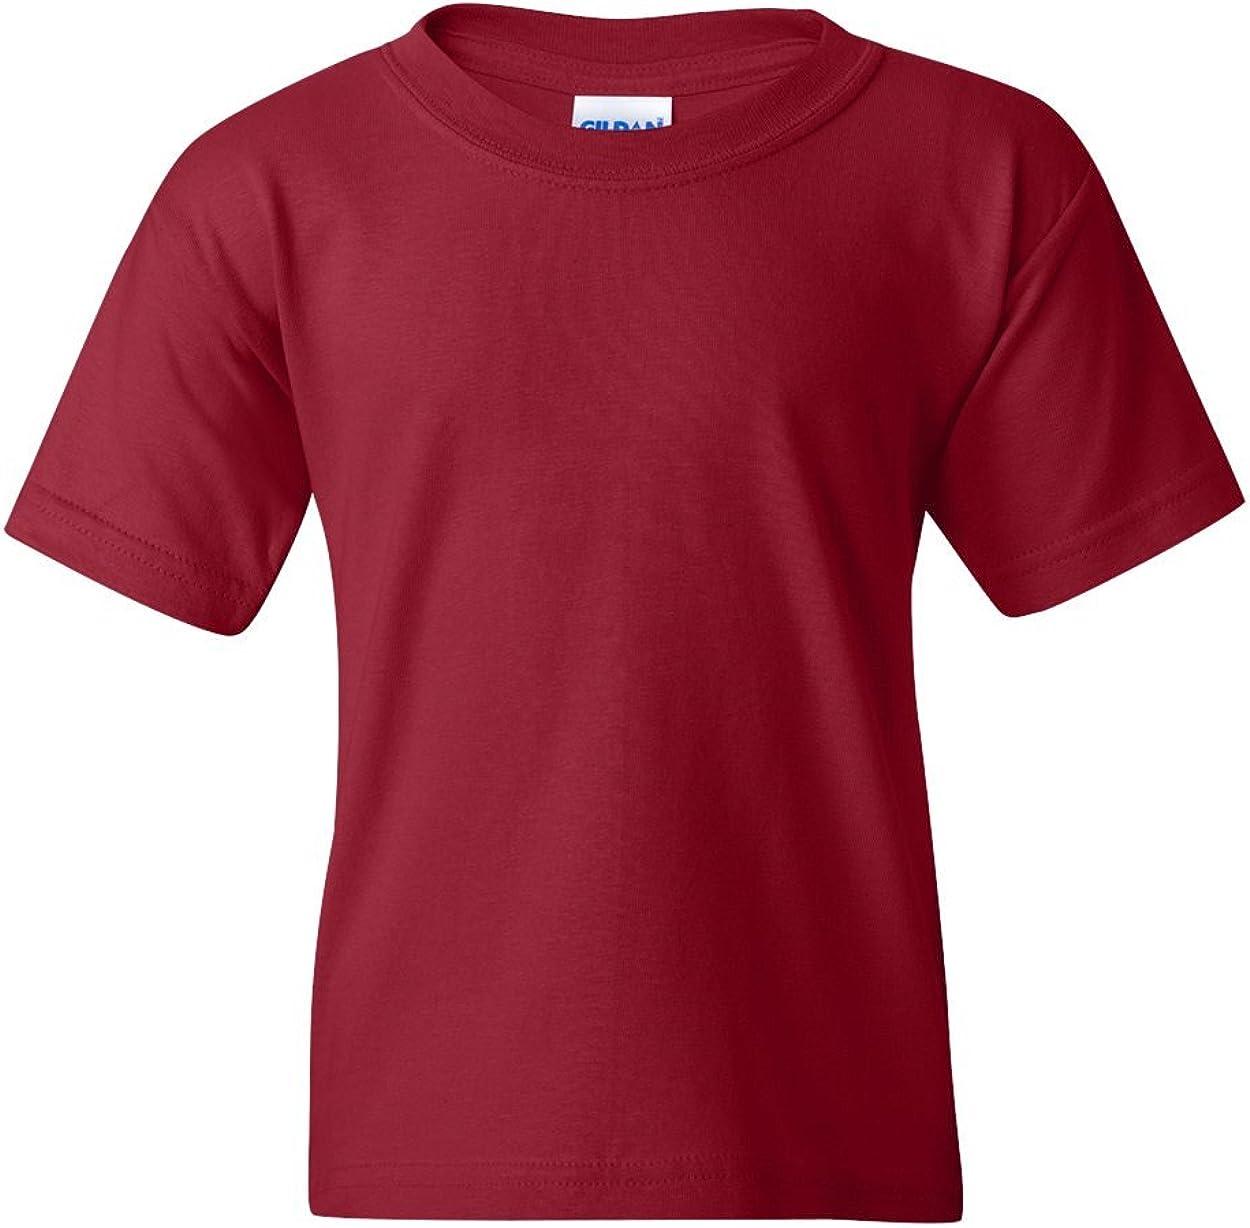 Gildan G500B Heavy CottonTM Youth 5.3 oz. T-Shirt - GARNET - S